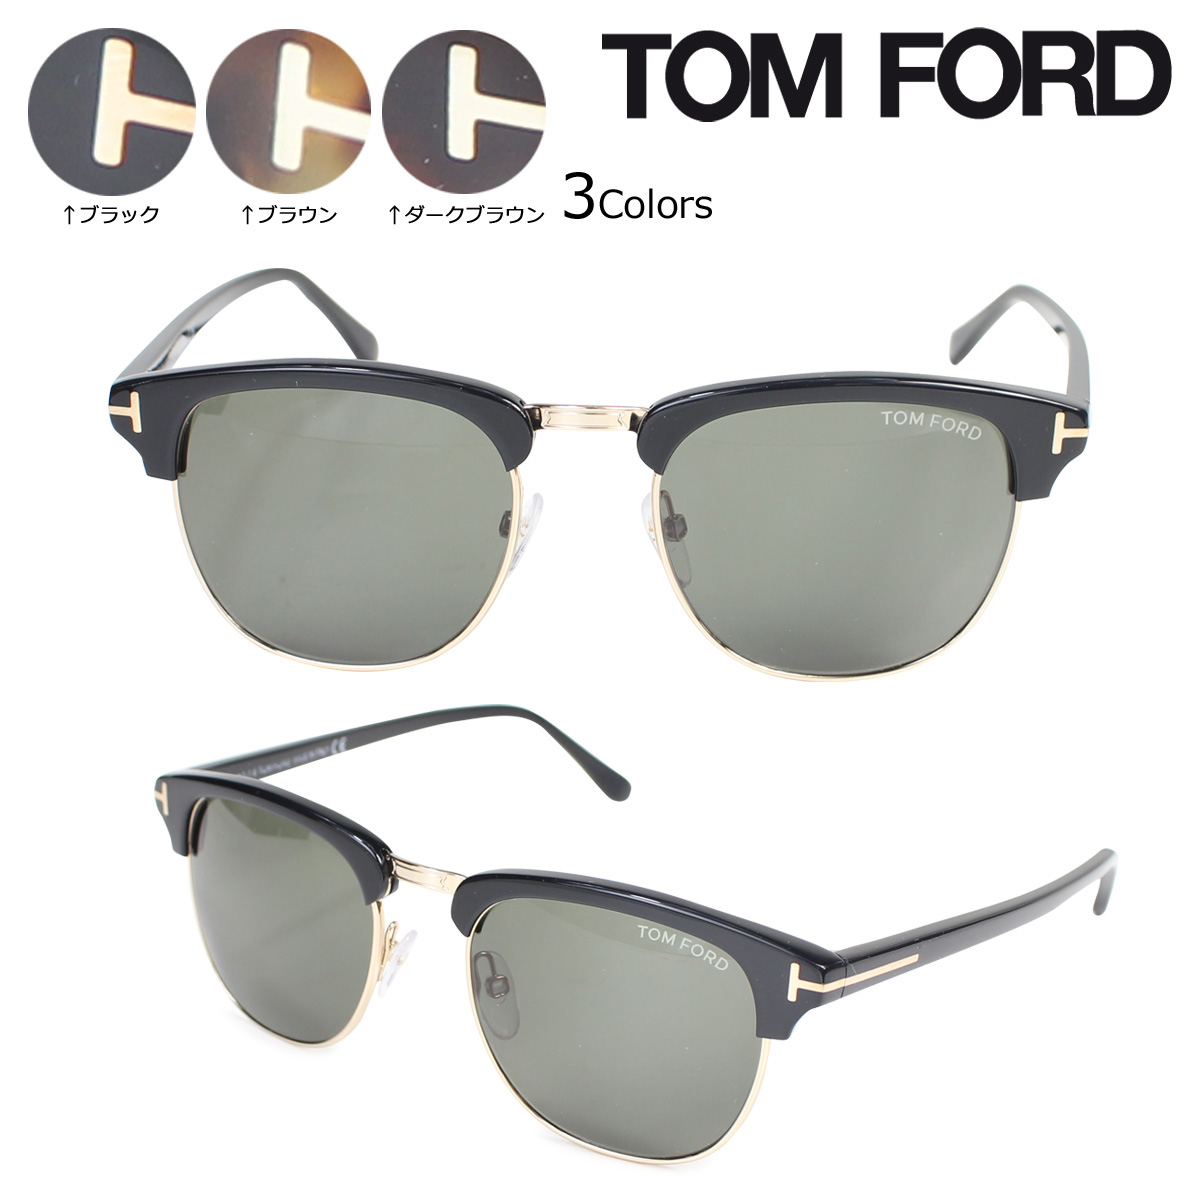 1d6b0d274f SneaK Online Shop  Tom Ford TOM FORD sunglasses glasses men gap Dis ...